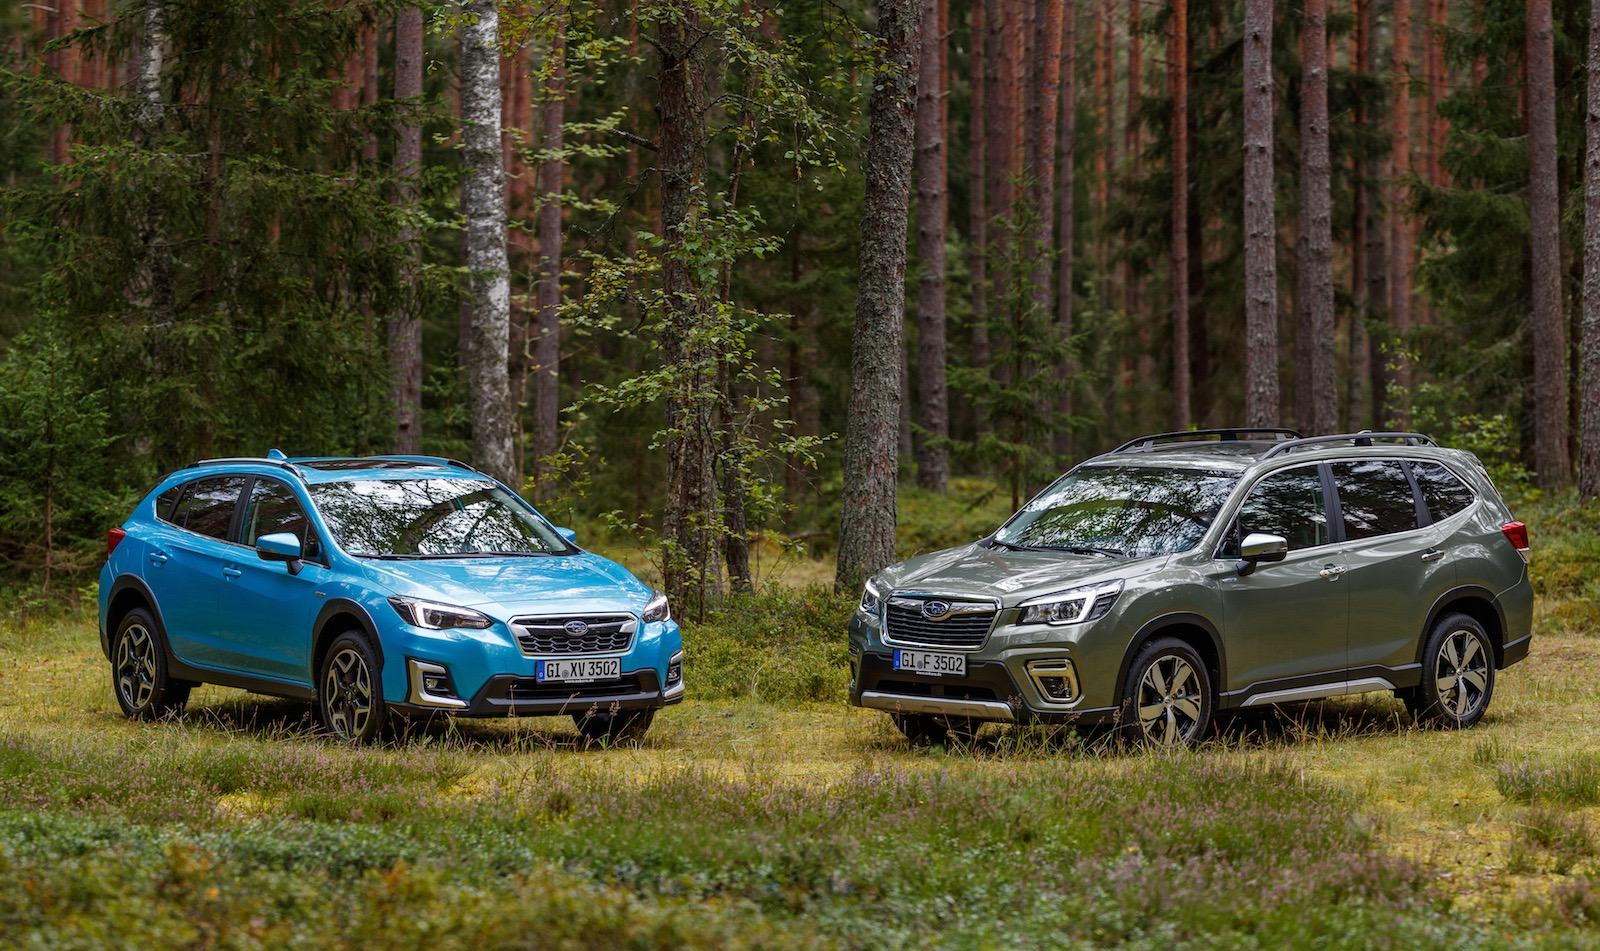 2020 Subaru Xv Hybrid Forester Hybrid On Sale In Australia In March Performancedrive